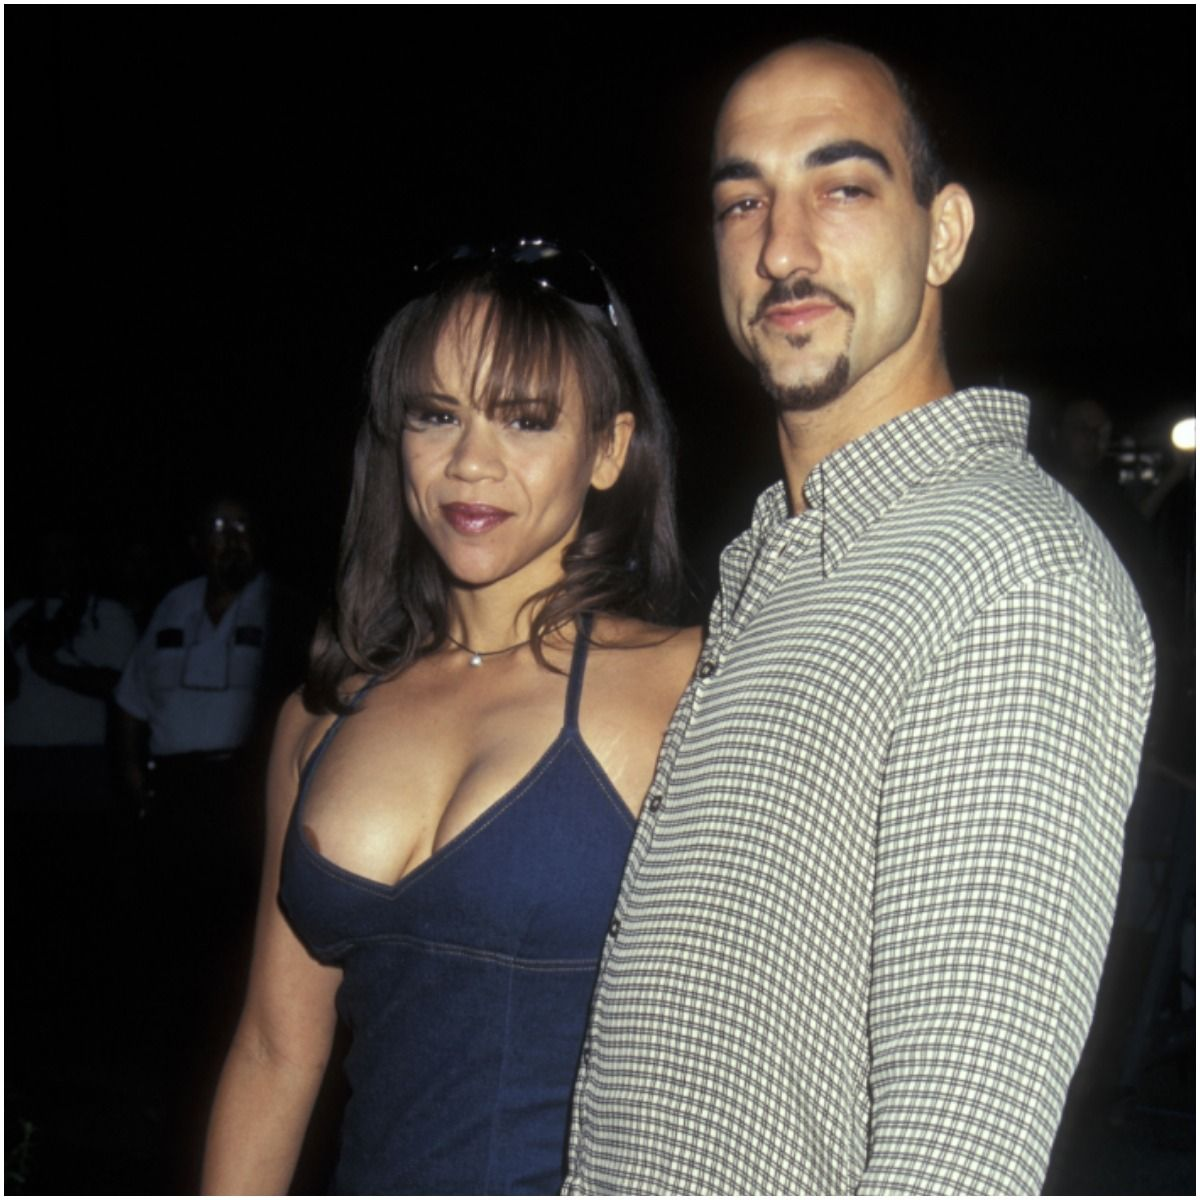 Rosie Perez with her husband Seth Zvi Rosenfeld